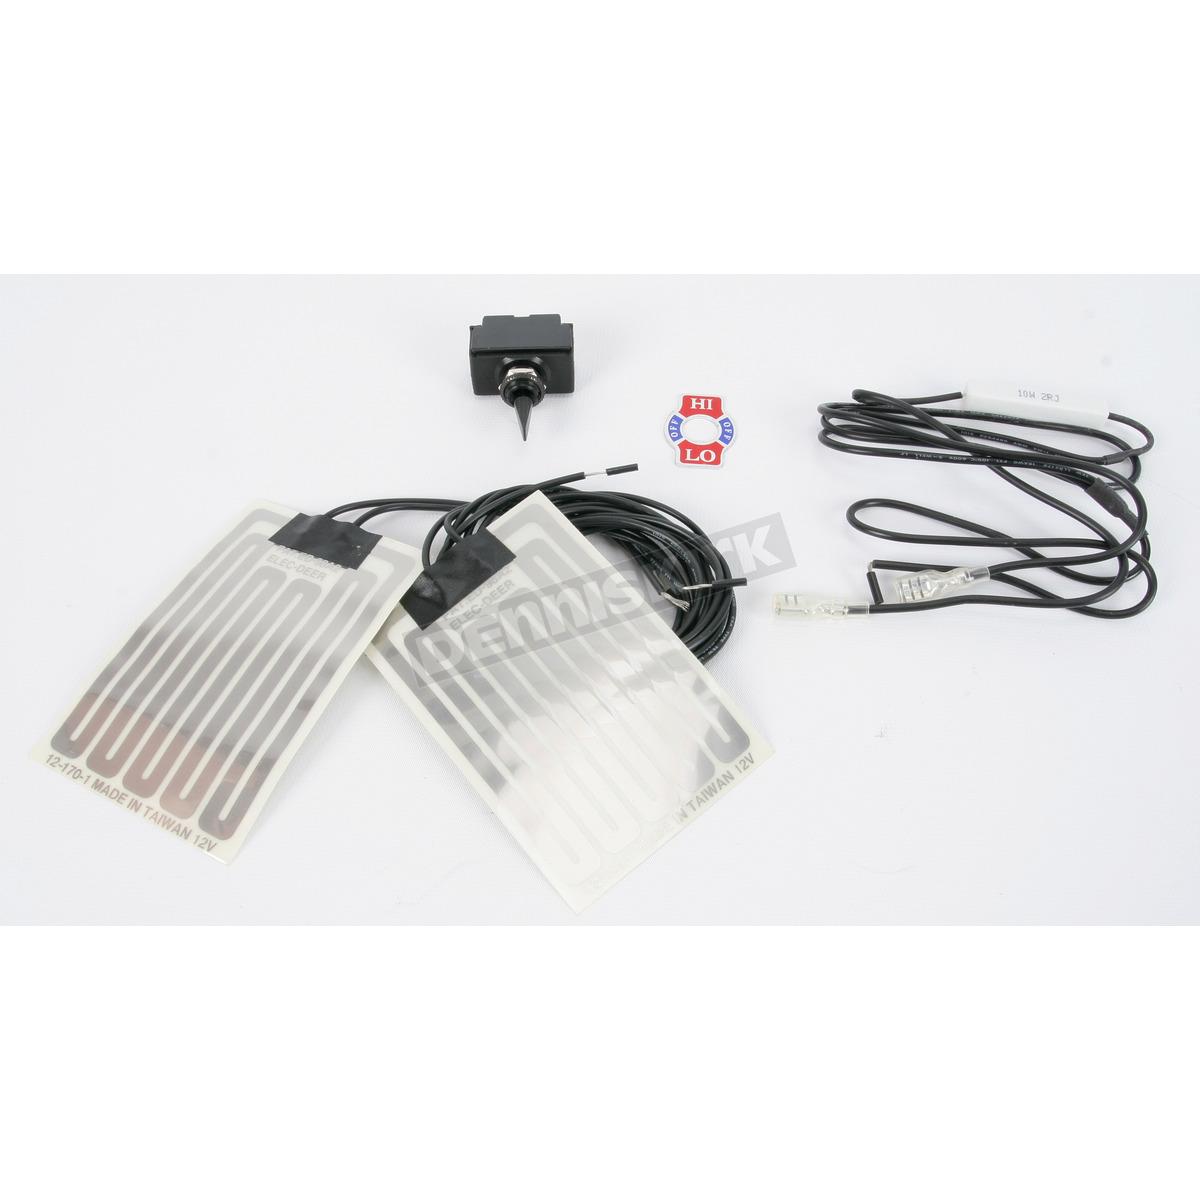 hight resolution of handlebar grip heater kit 12 170